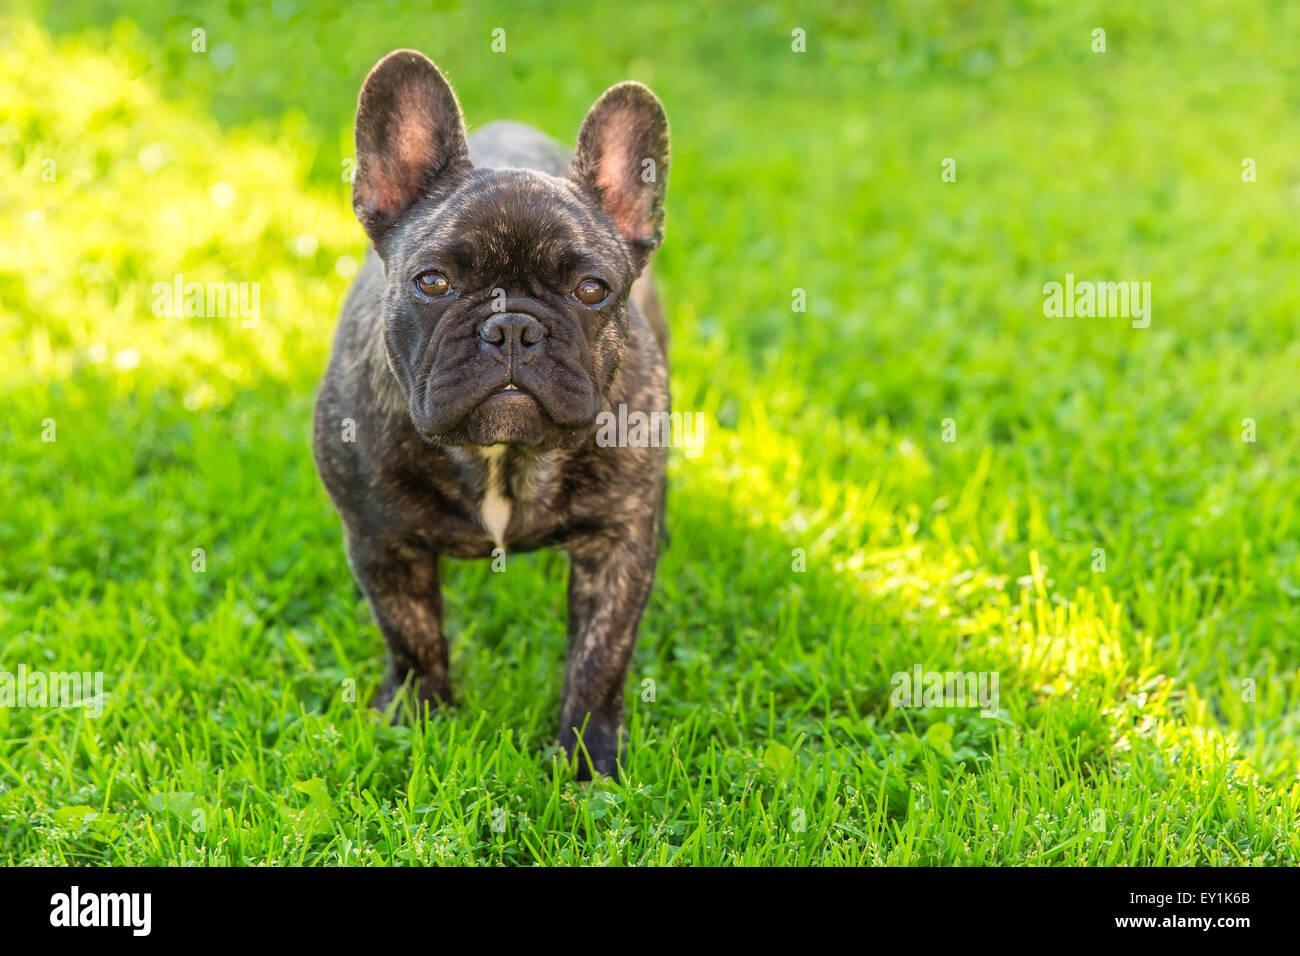 cute domestic dog brindle French Bulldog breed - Stock Image